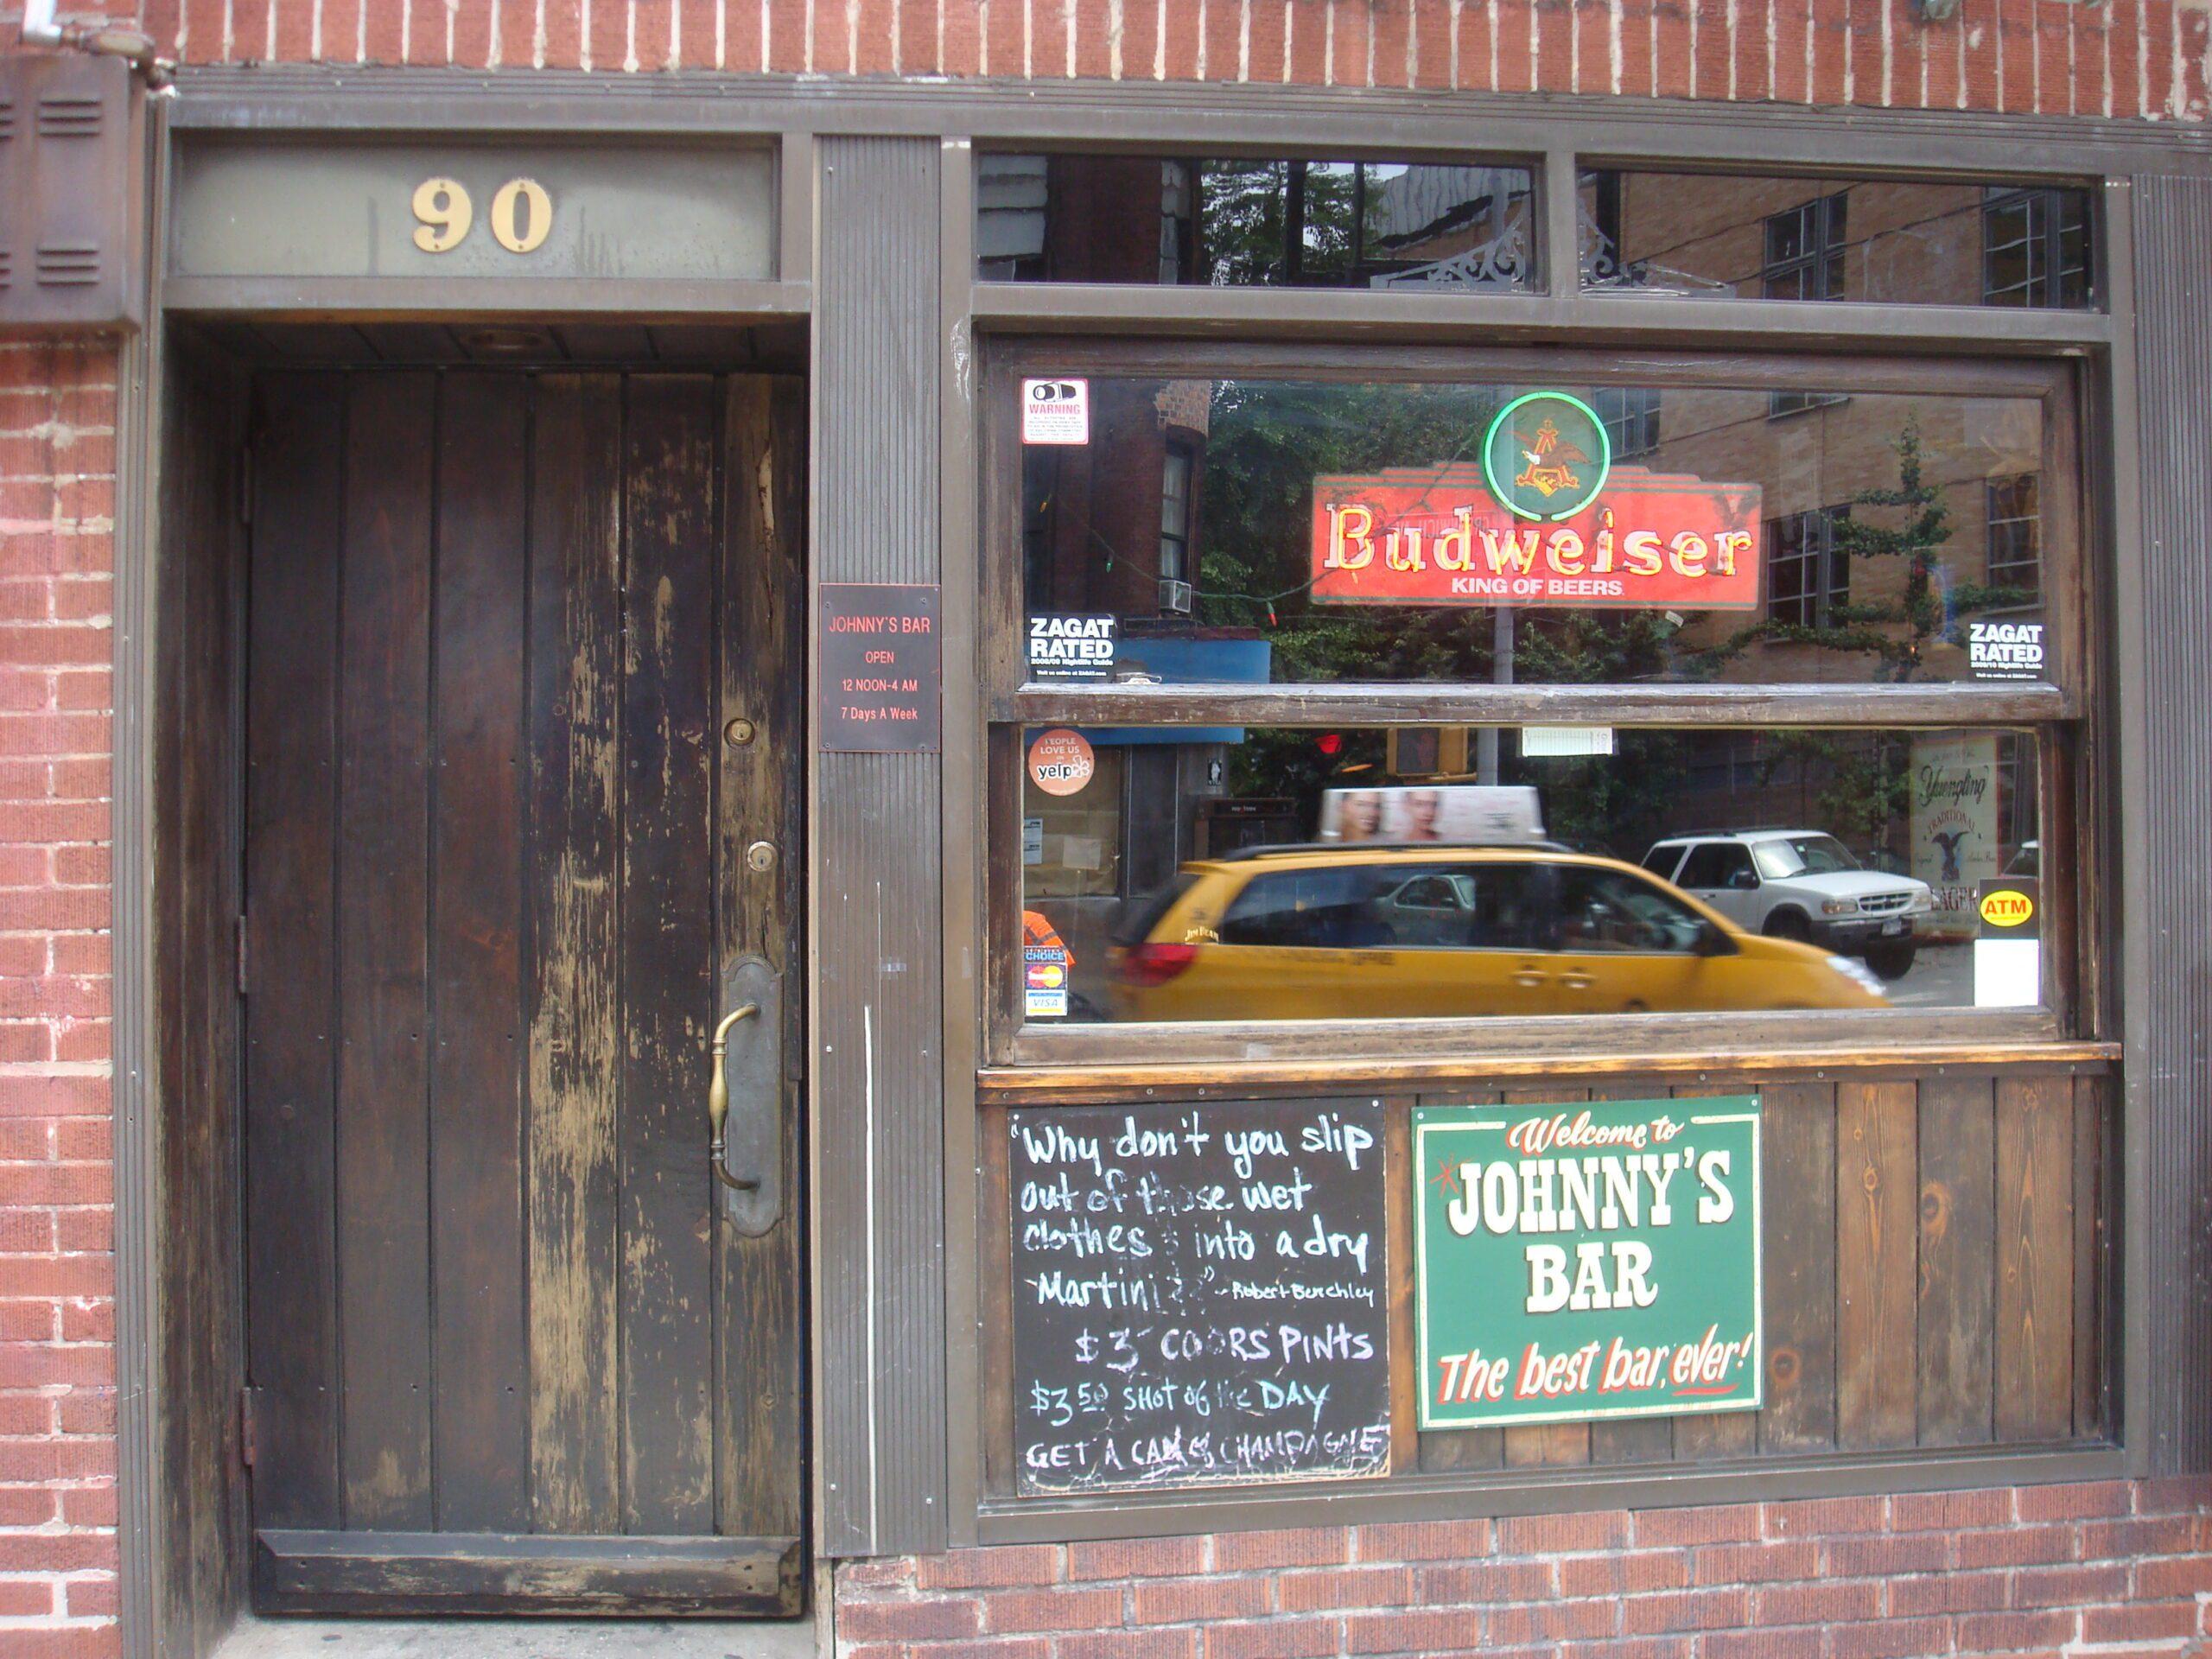 Johnny's Bar